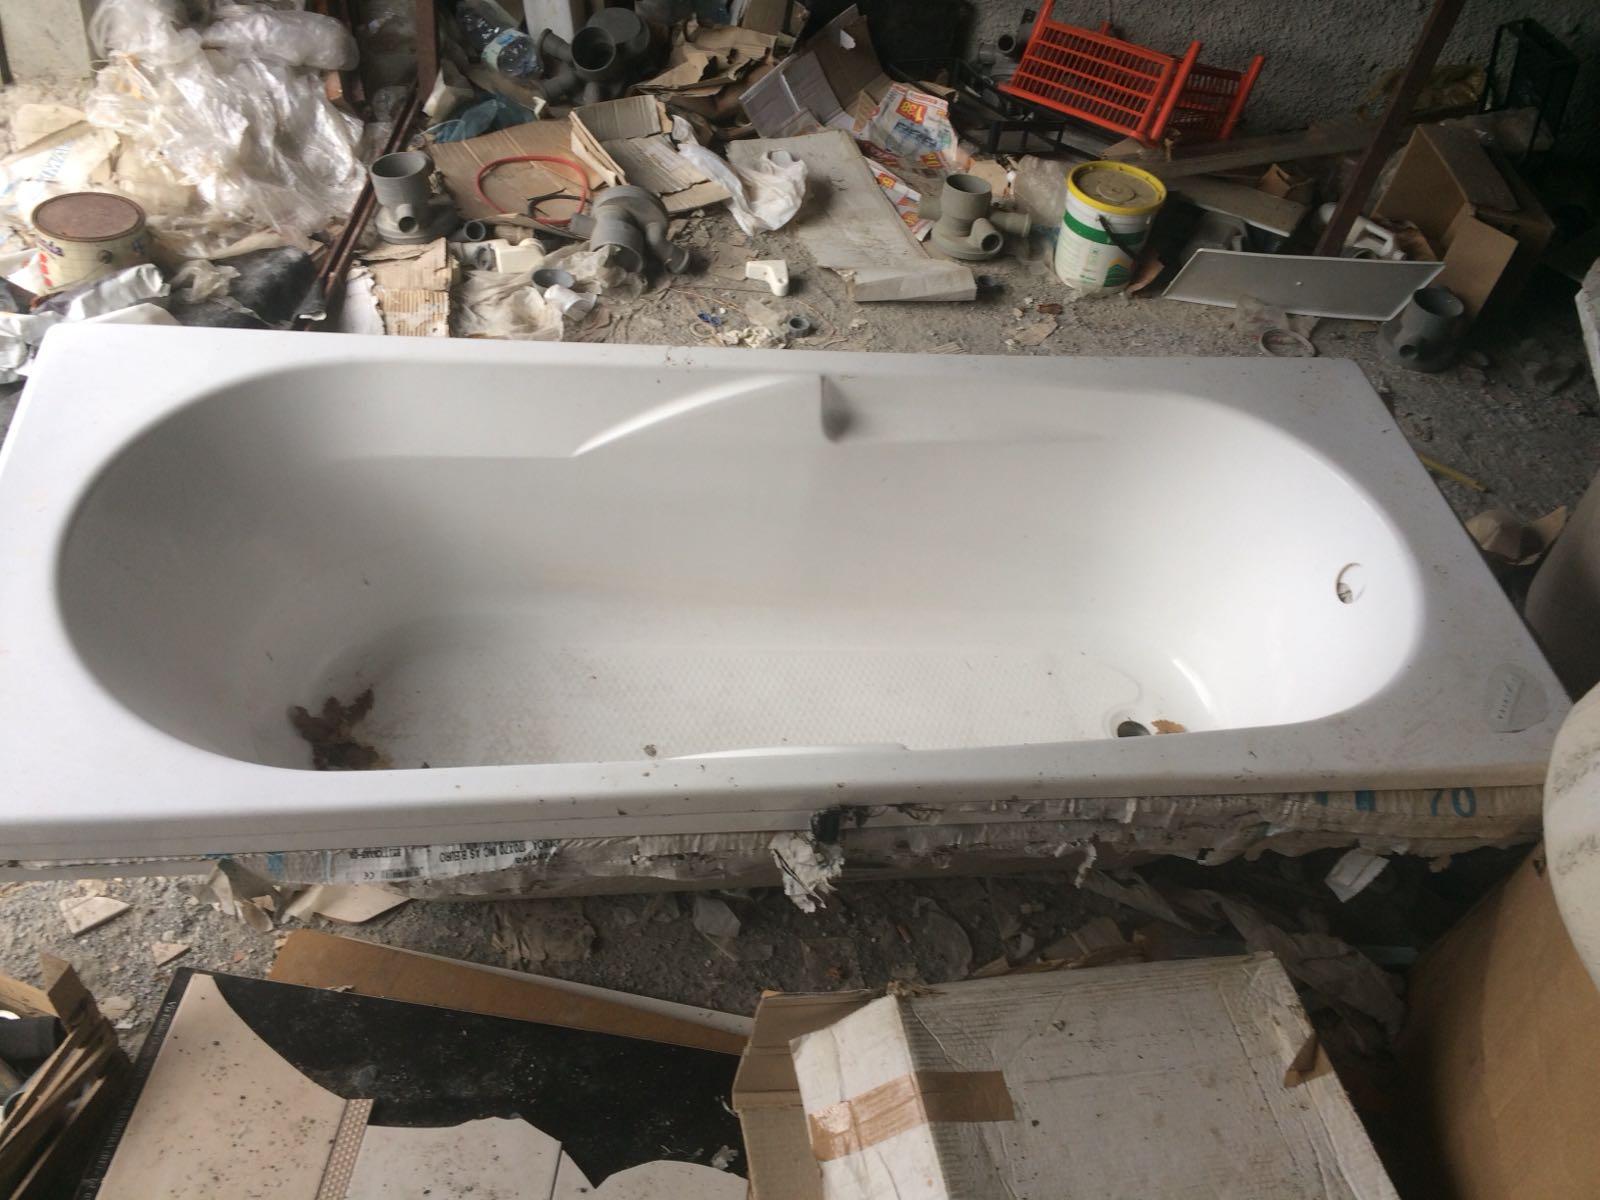 Vasche Da Bagno In Vetroresina Misure : Vasca da bagno in vetroresina rettangolare astemobili